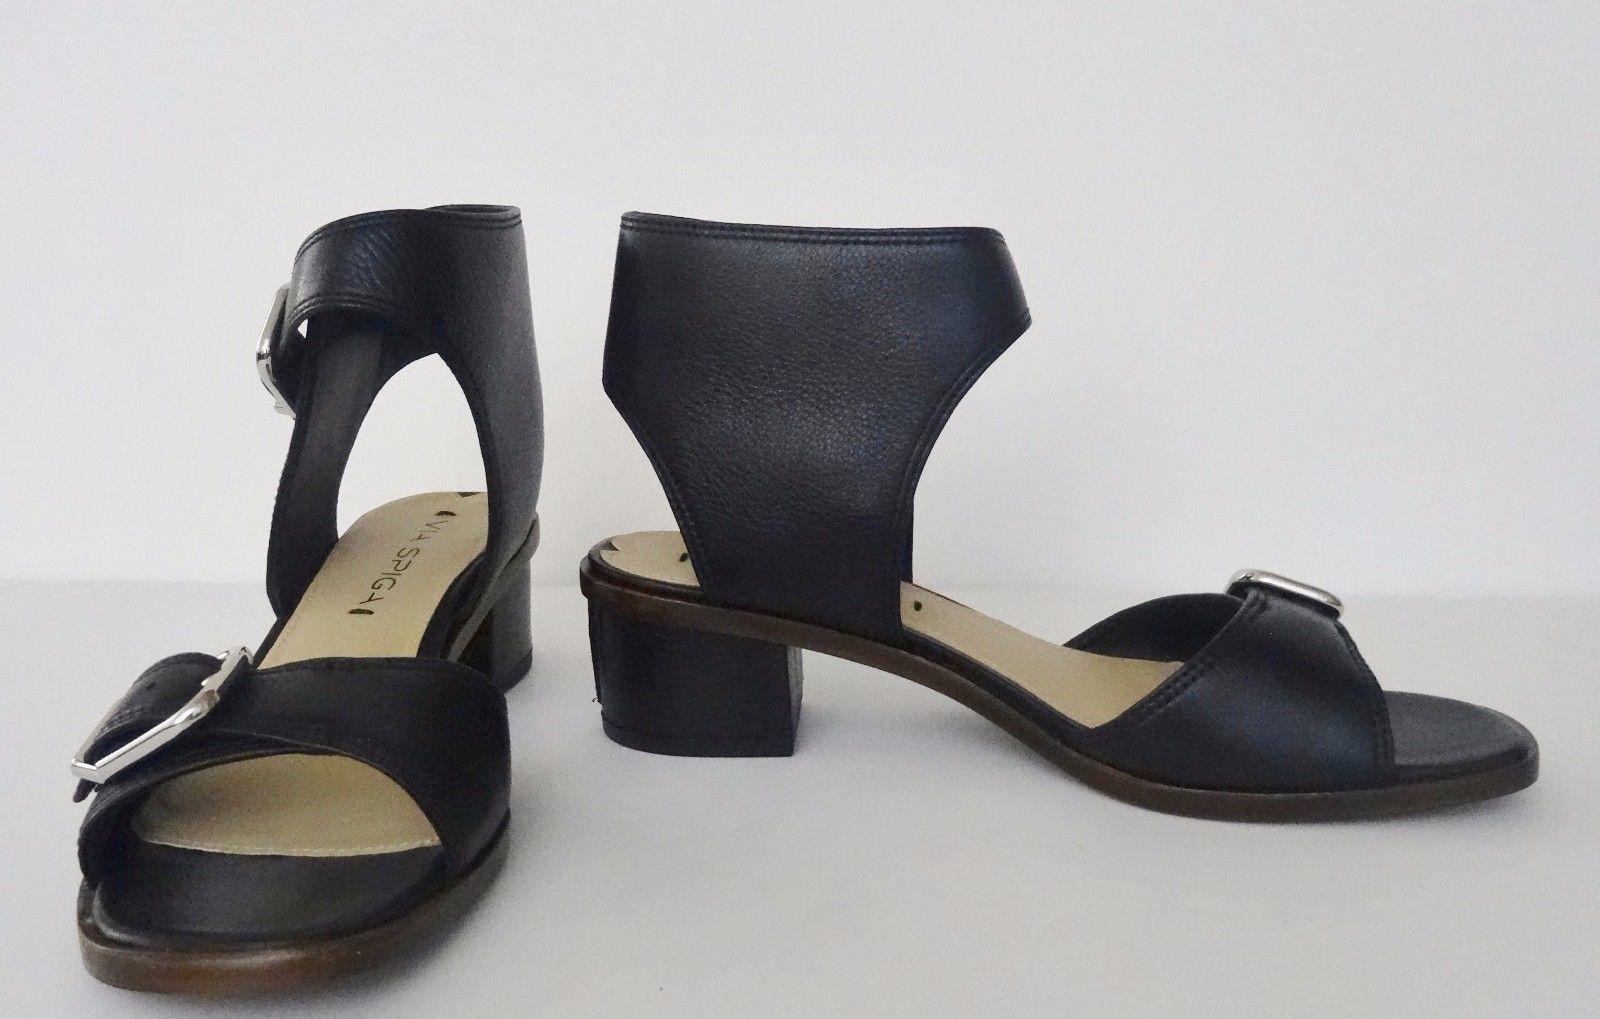 a7241ff1ff1 S l1600. S l1600. Previous. NIB Via Spiga Minerva Womens Leather Ankle  Sandals Size 6.5 M 37 ...